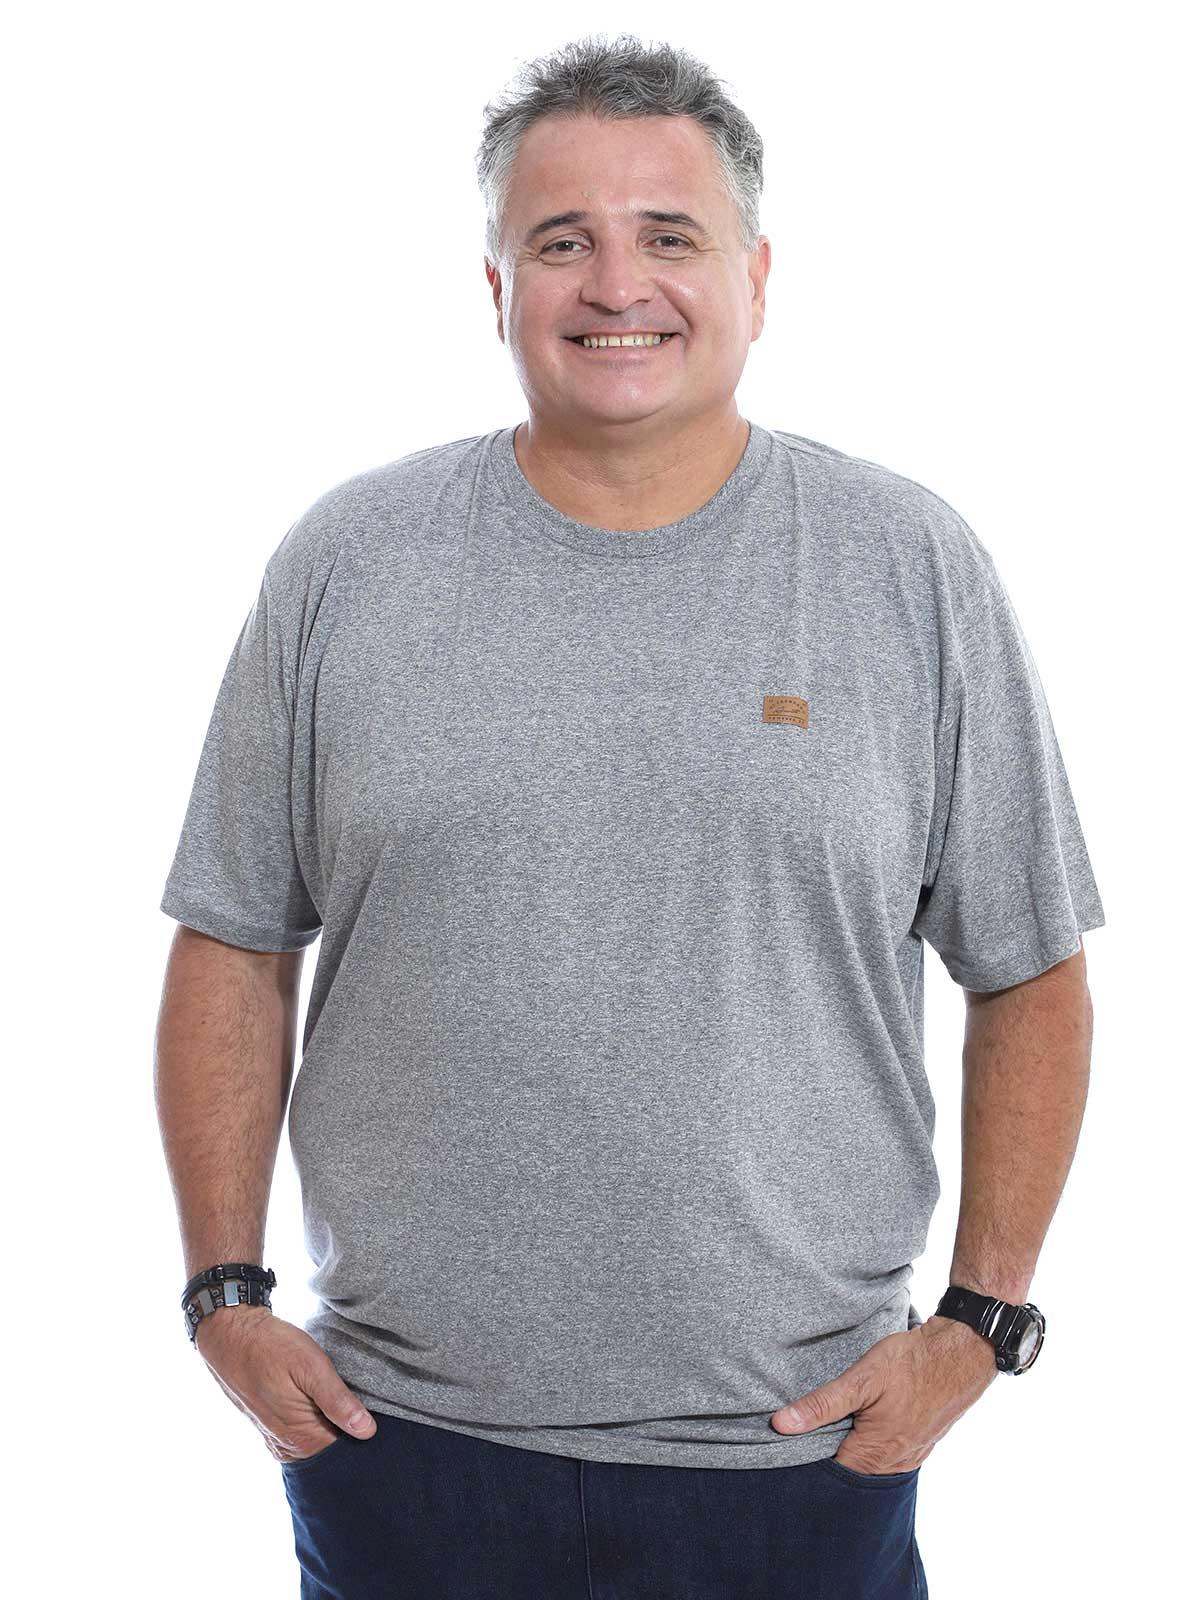 Camiseta Plus Size Anistia Mouline Ultra Fine Mescla Claro